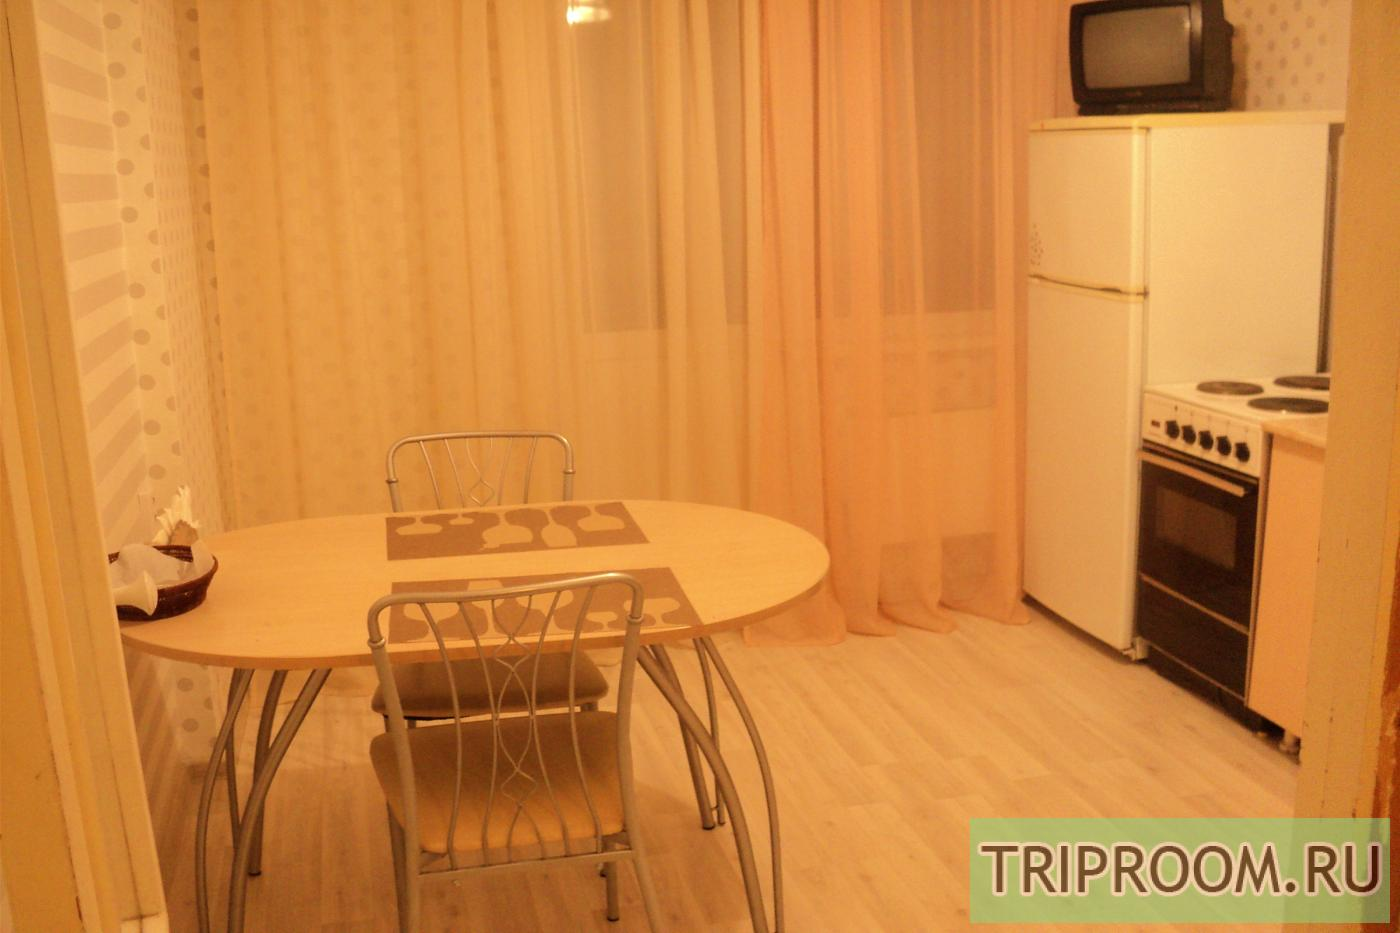 1-комнатная квартира посуточно (вариант № 1682), ул. 9-го Мая улица, фото № 3